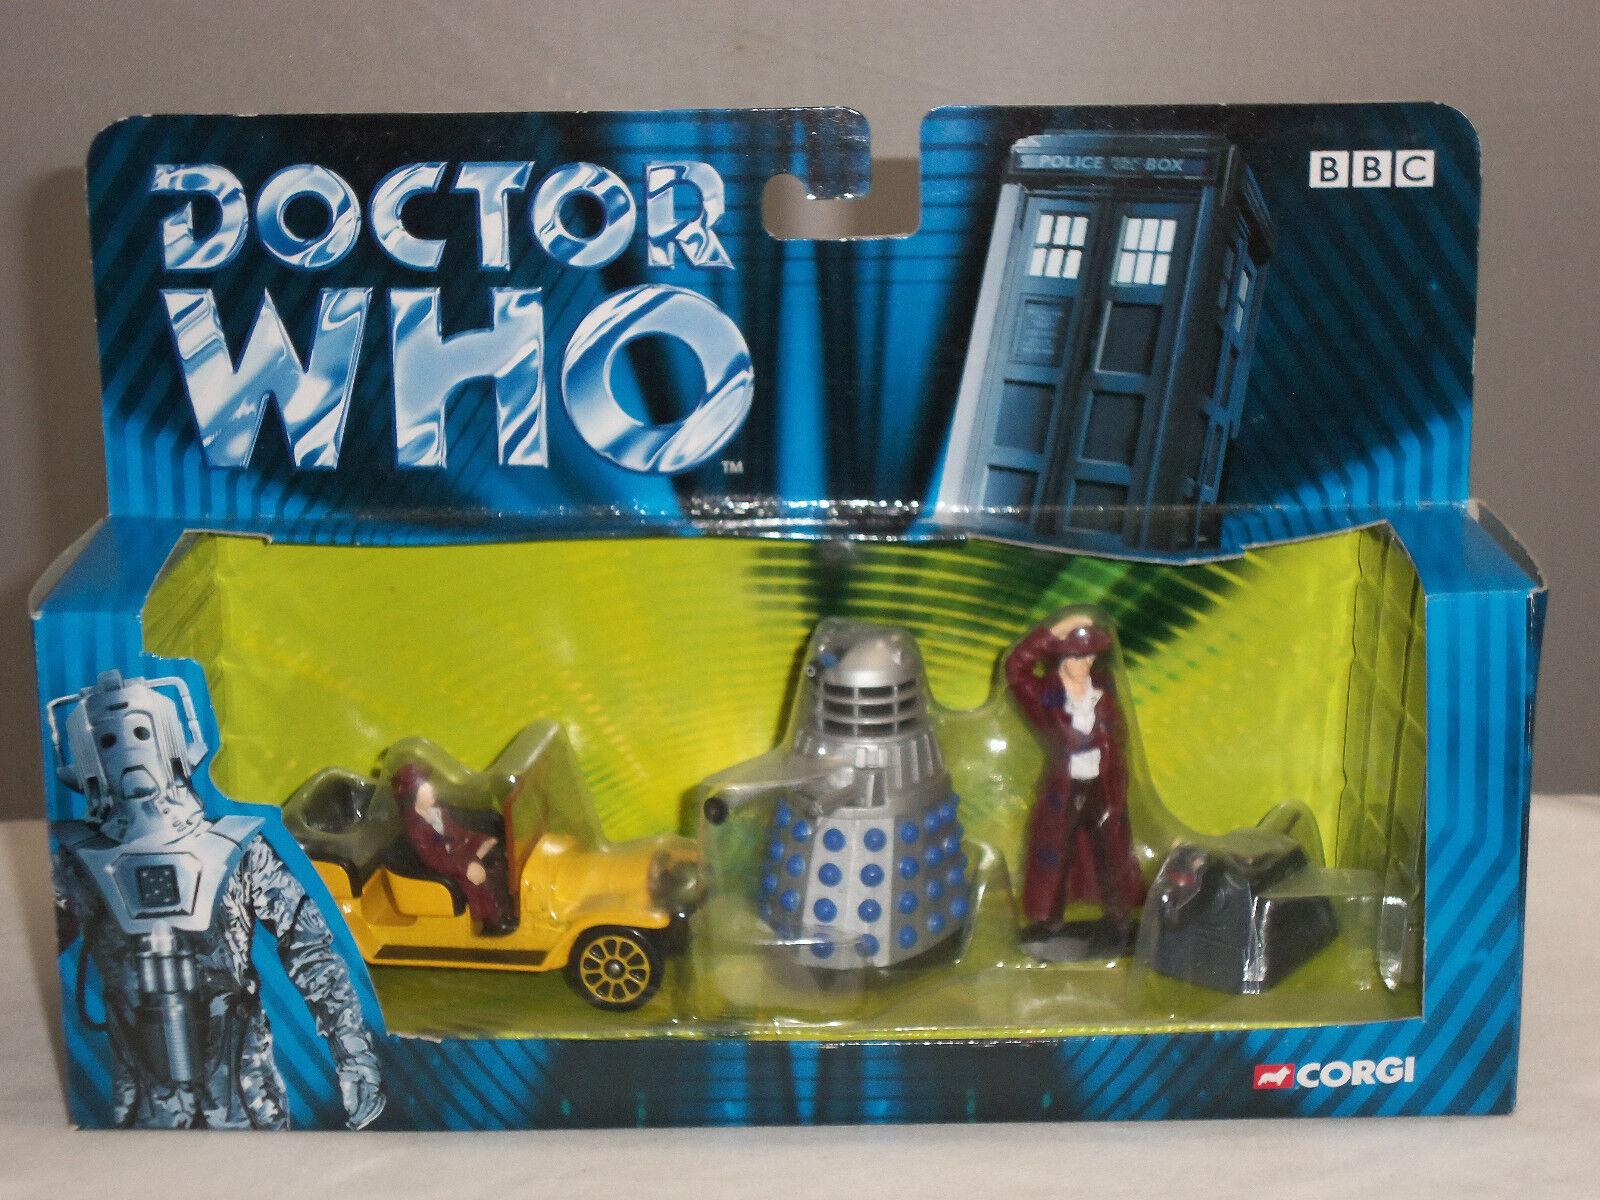 Corgi ty96201 dr. doktor, der tv - serie bessie auto dalek k9 metall festgesetzten betrag